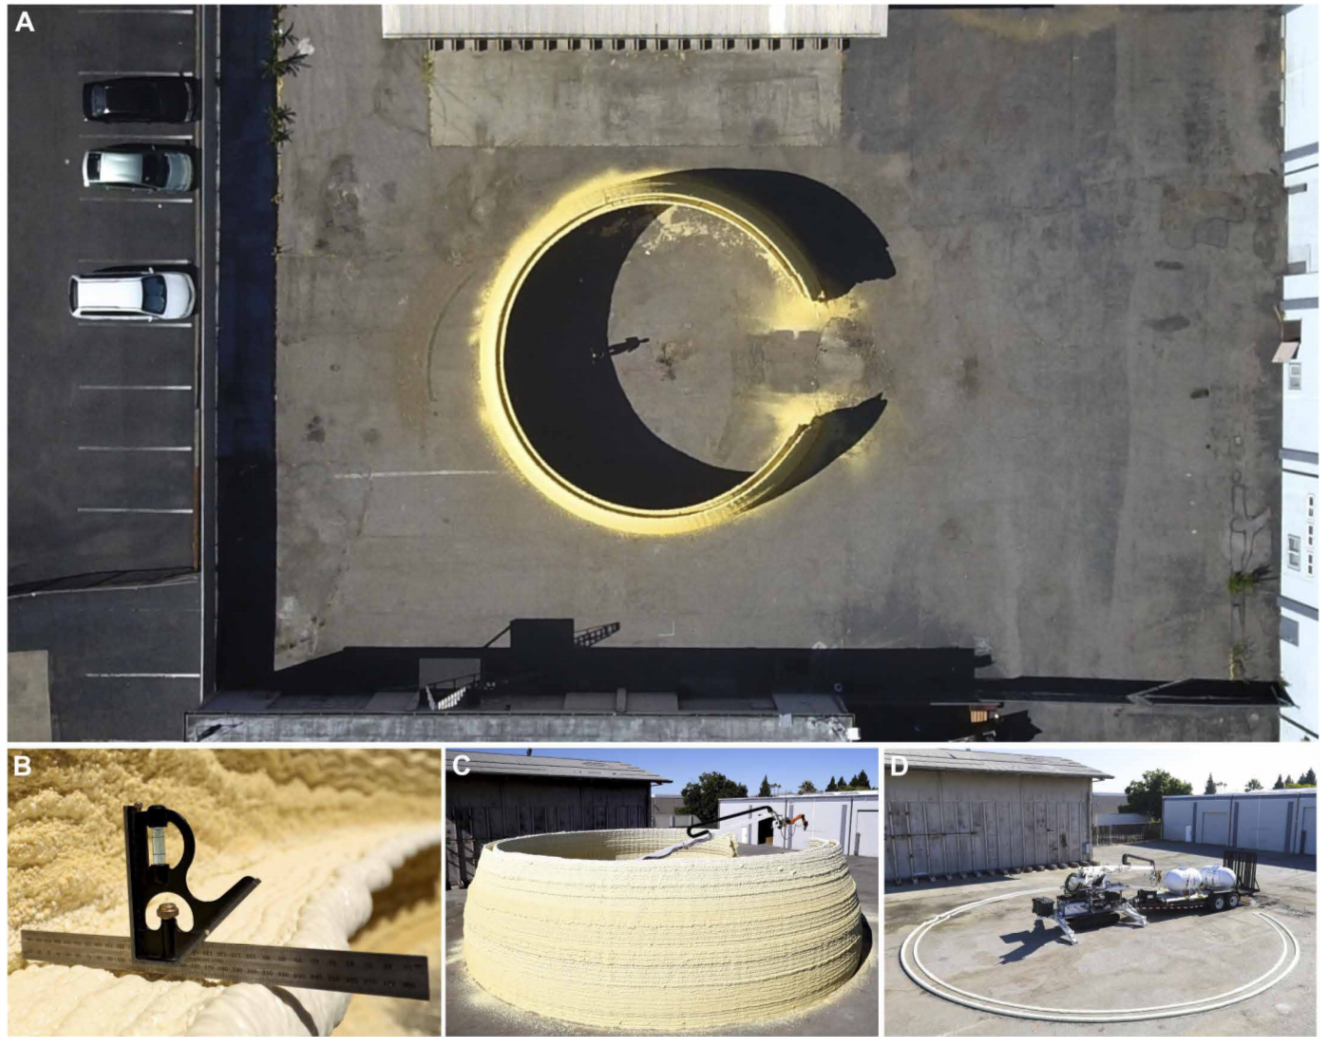 3D-printed-architectural-scale-hemi-ellipsodial-dome-section.-Photo-via-Science-Robotics.